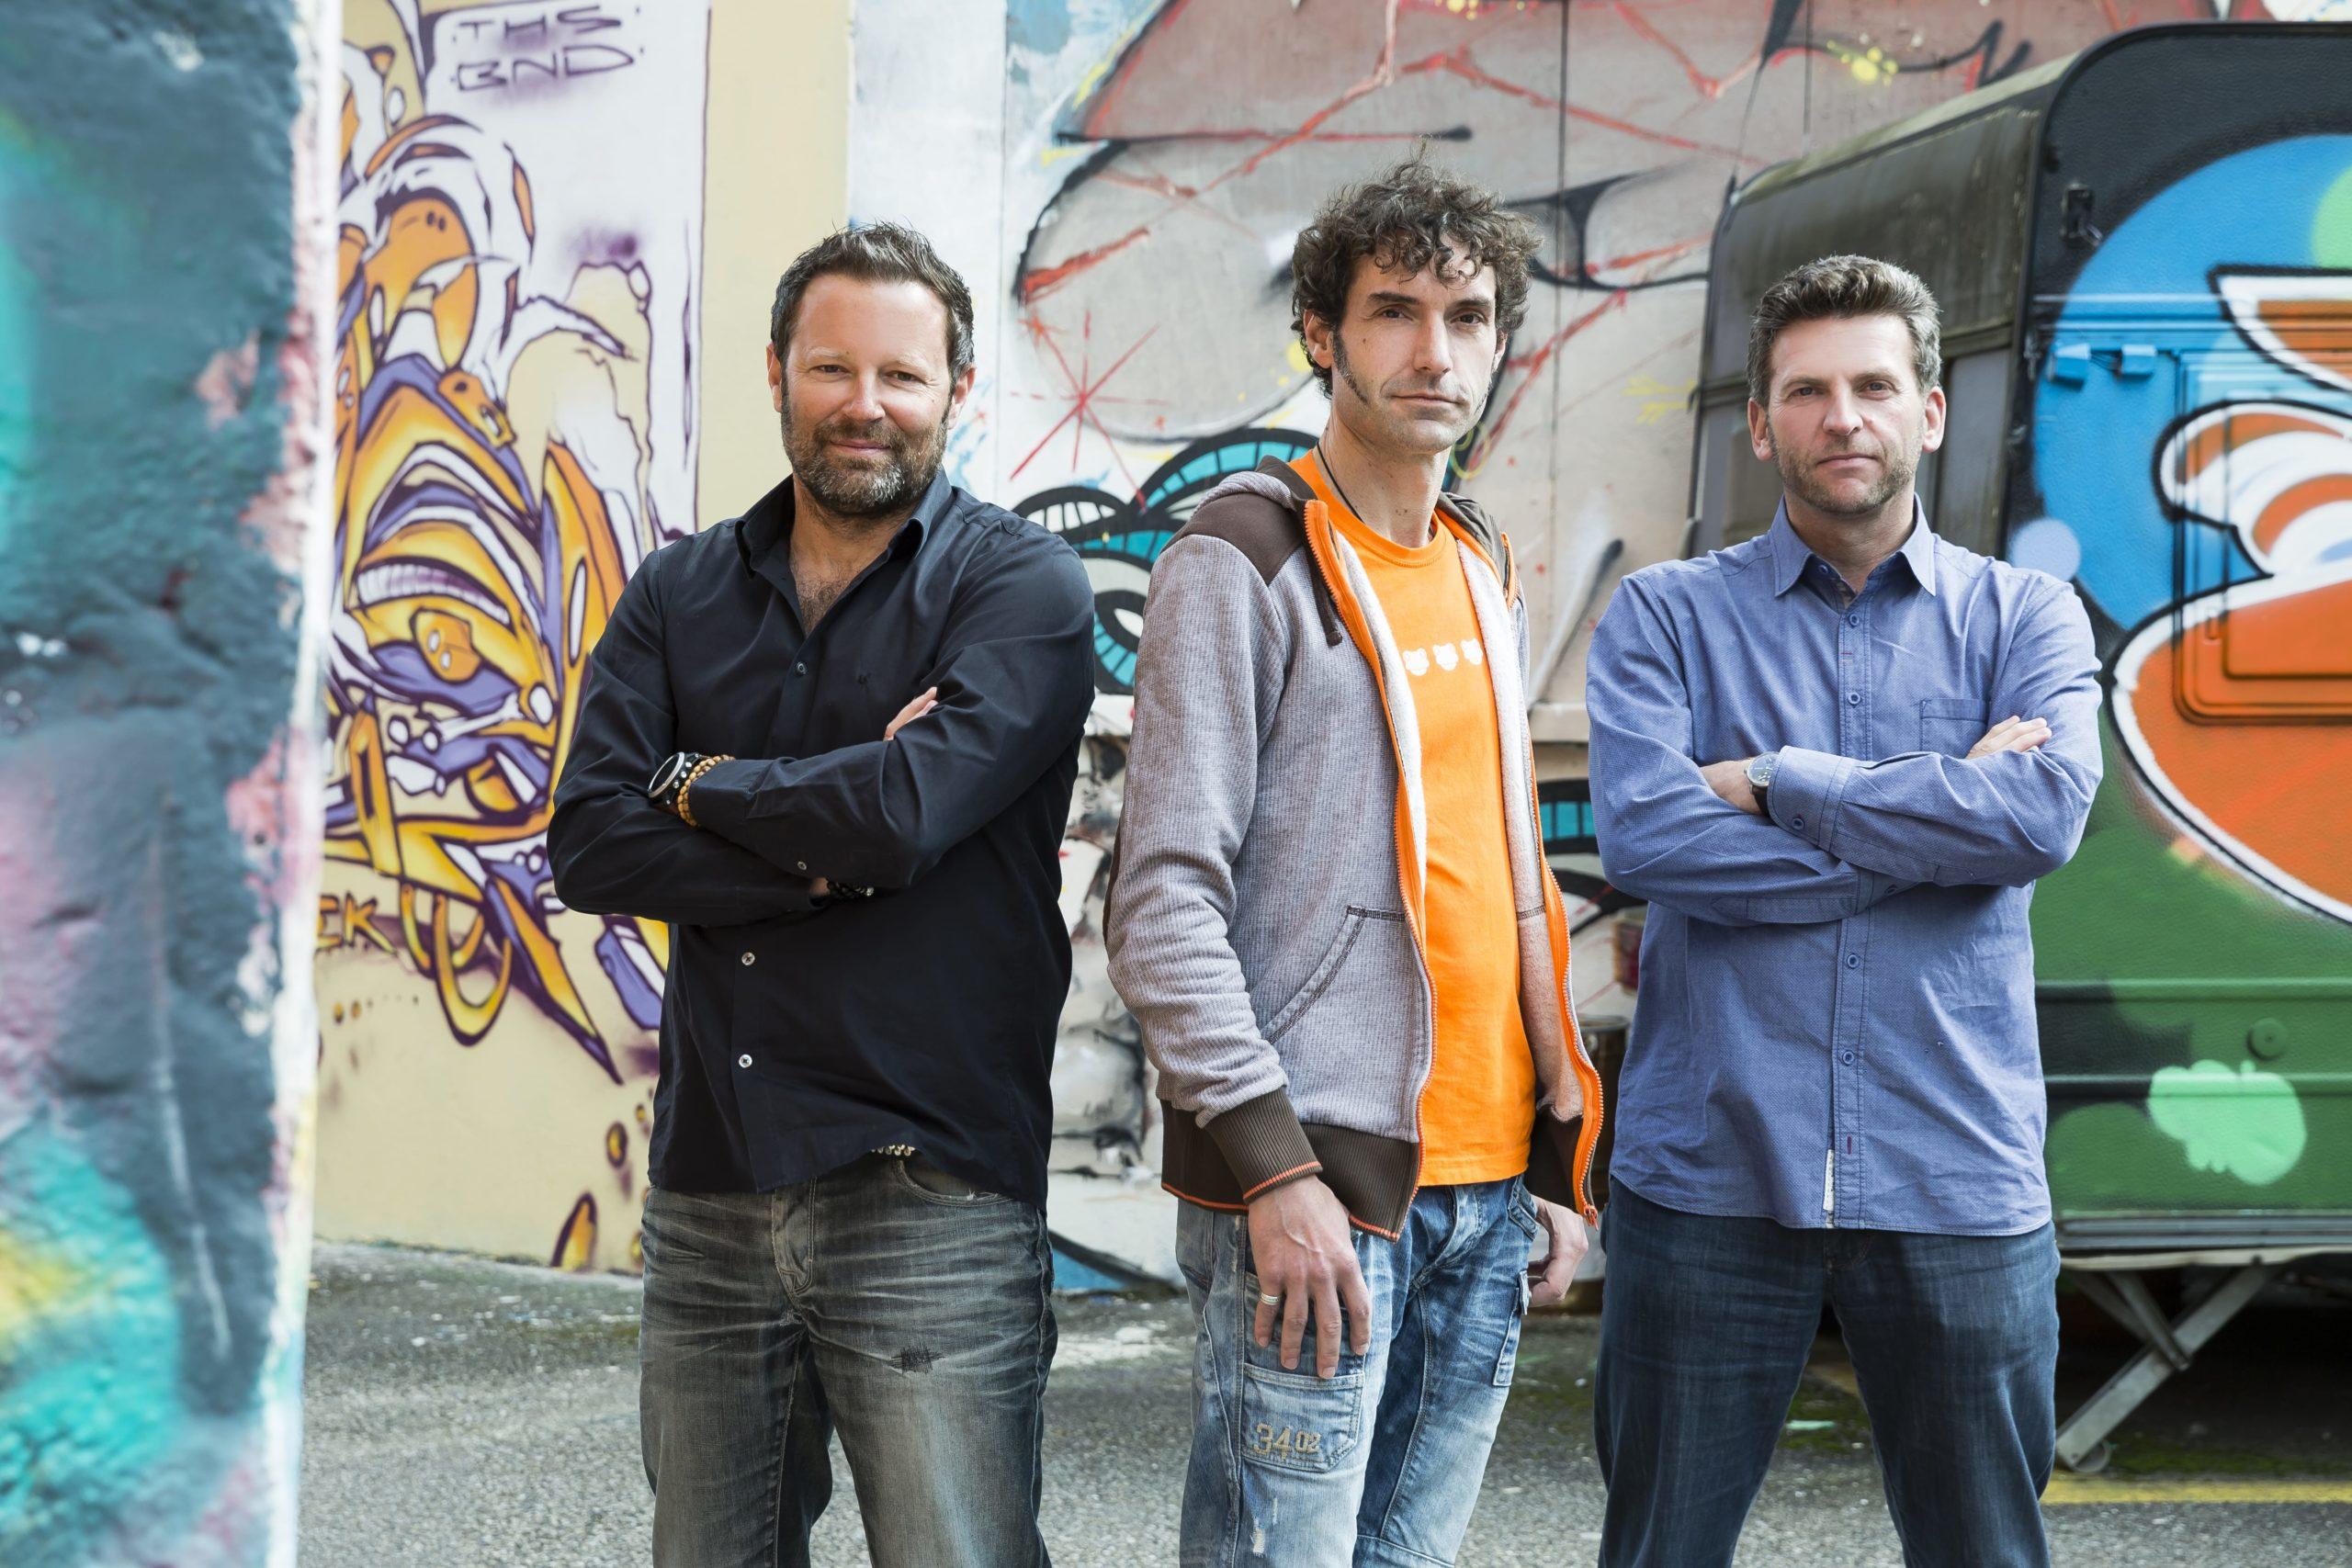 Eventfrog-Gründer Reto Baumgartner, Mike Müller und Urs Koller (von links, Foto: Eventfrog)